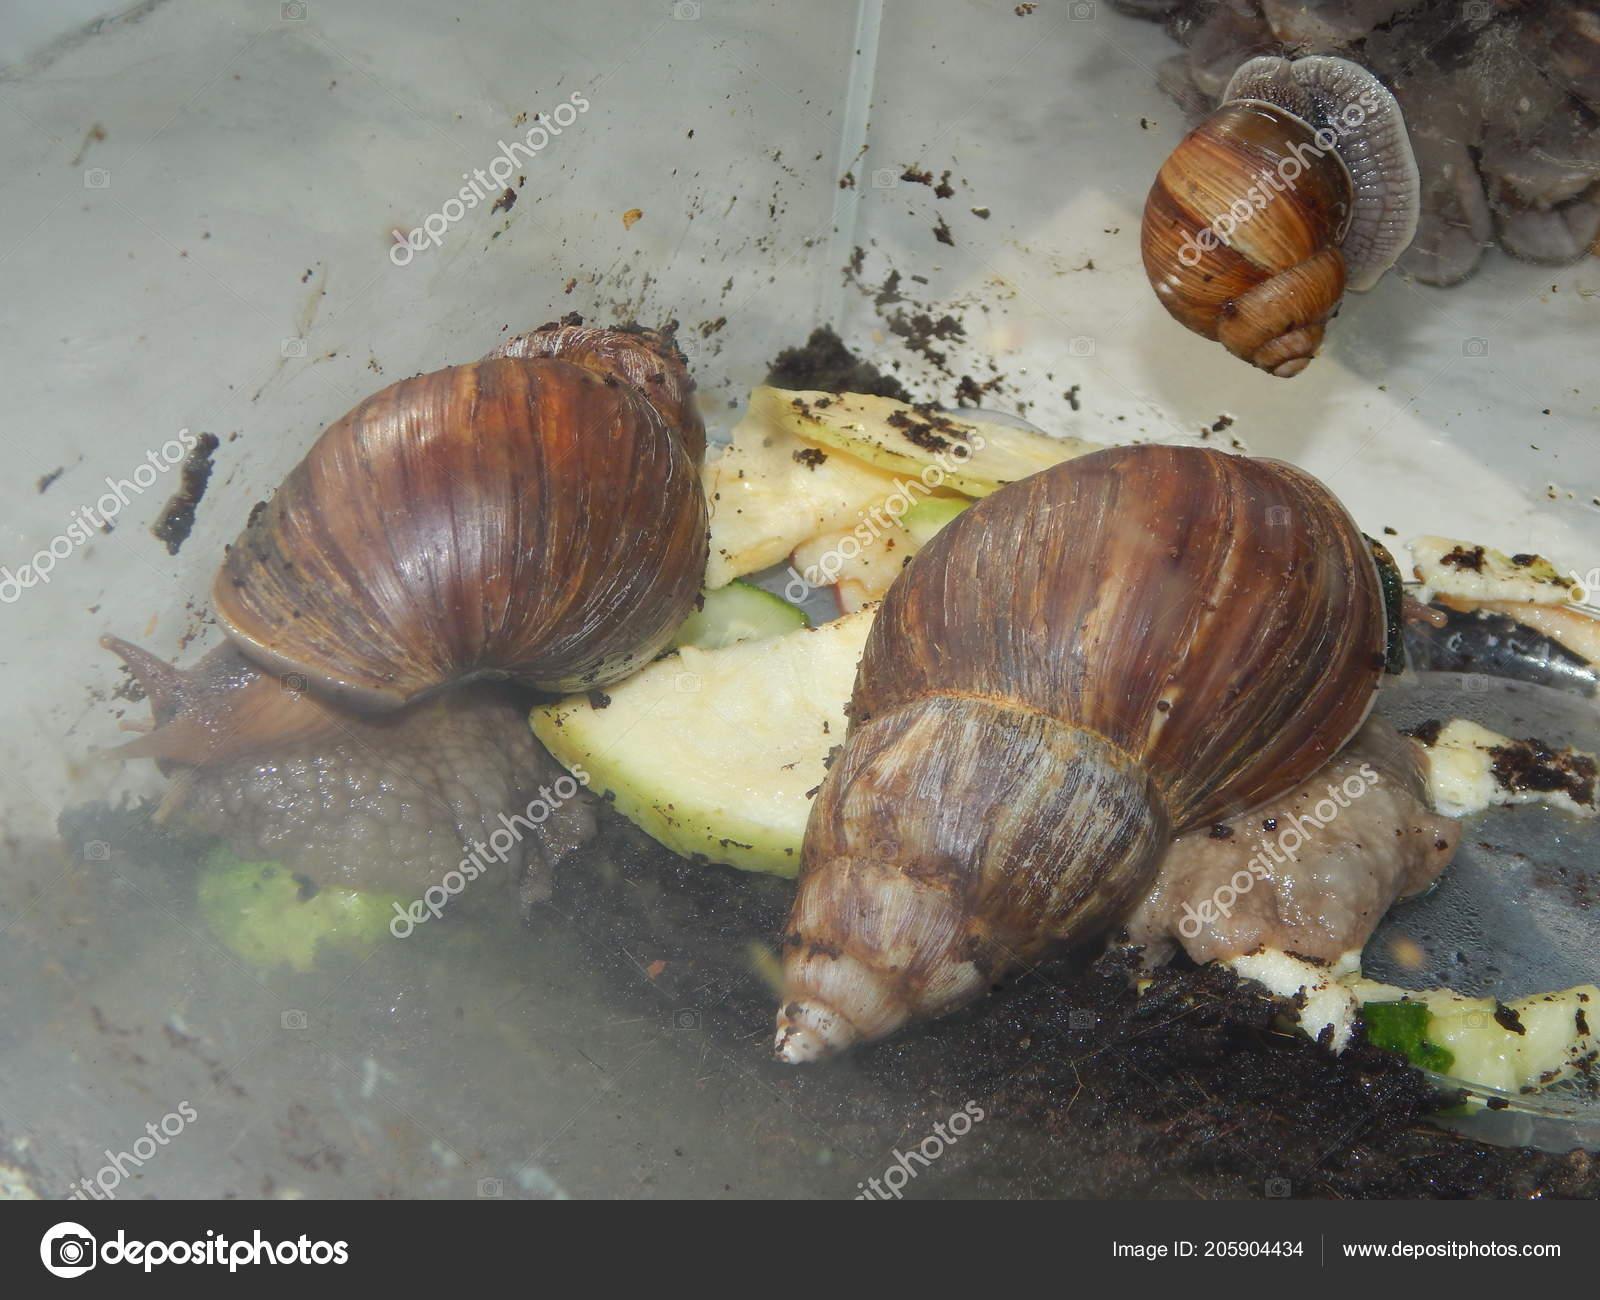 Breeding Large Snails Terrarium House Stock Photo Image By C Apxipro Gmail Com 205904434